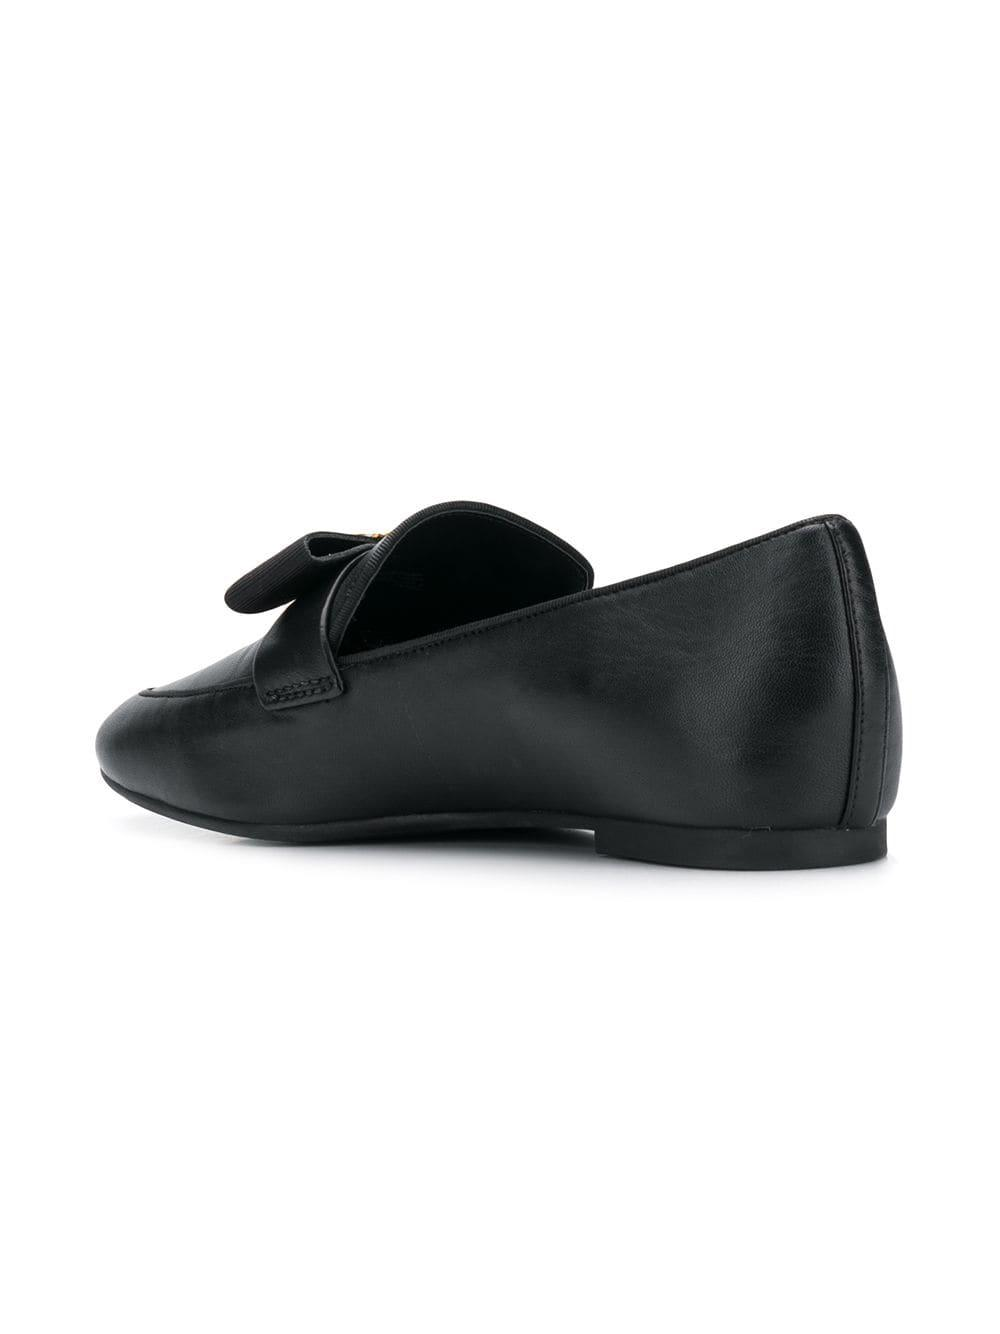 956f0fc9b63 Lyst - Michael Michael Kors Flat Bow Loafers in Black